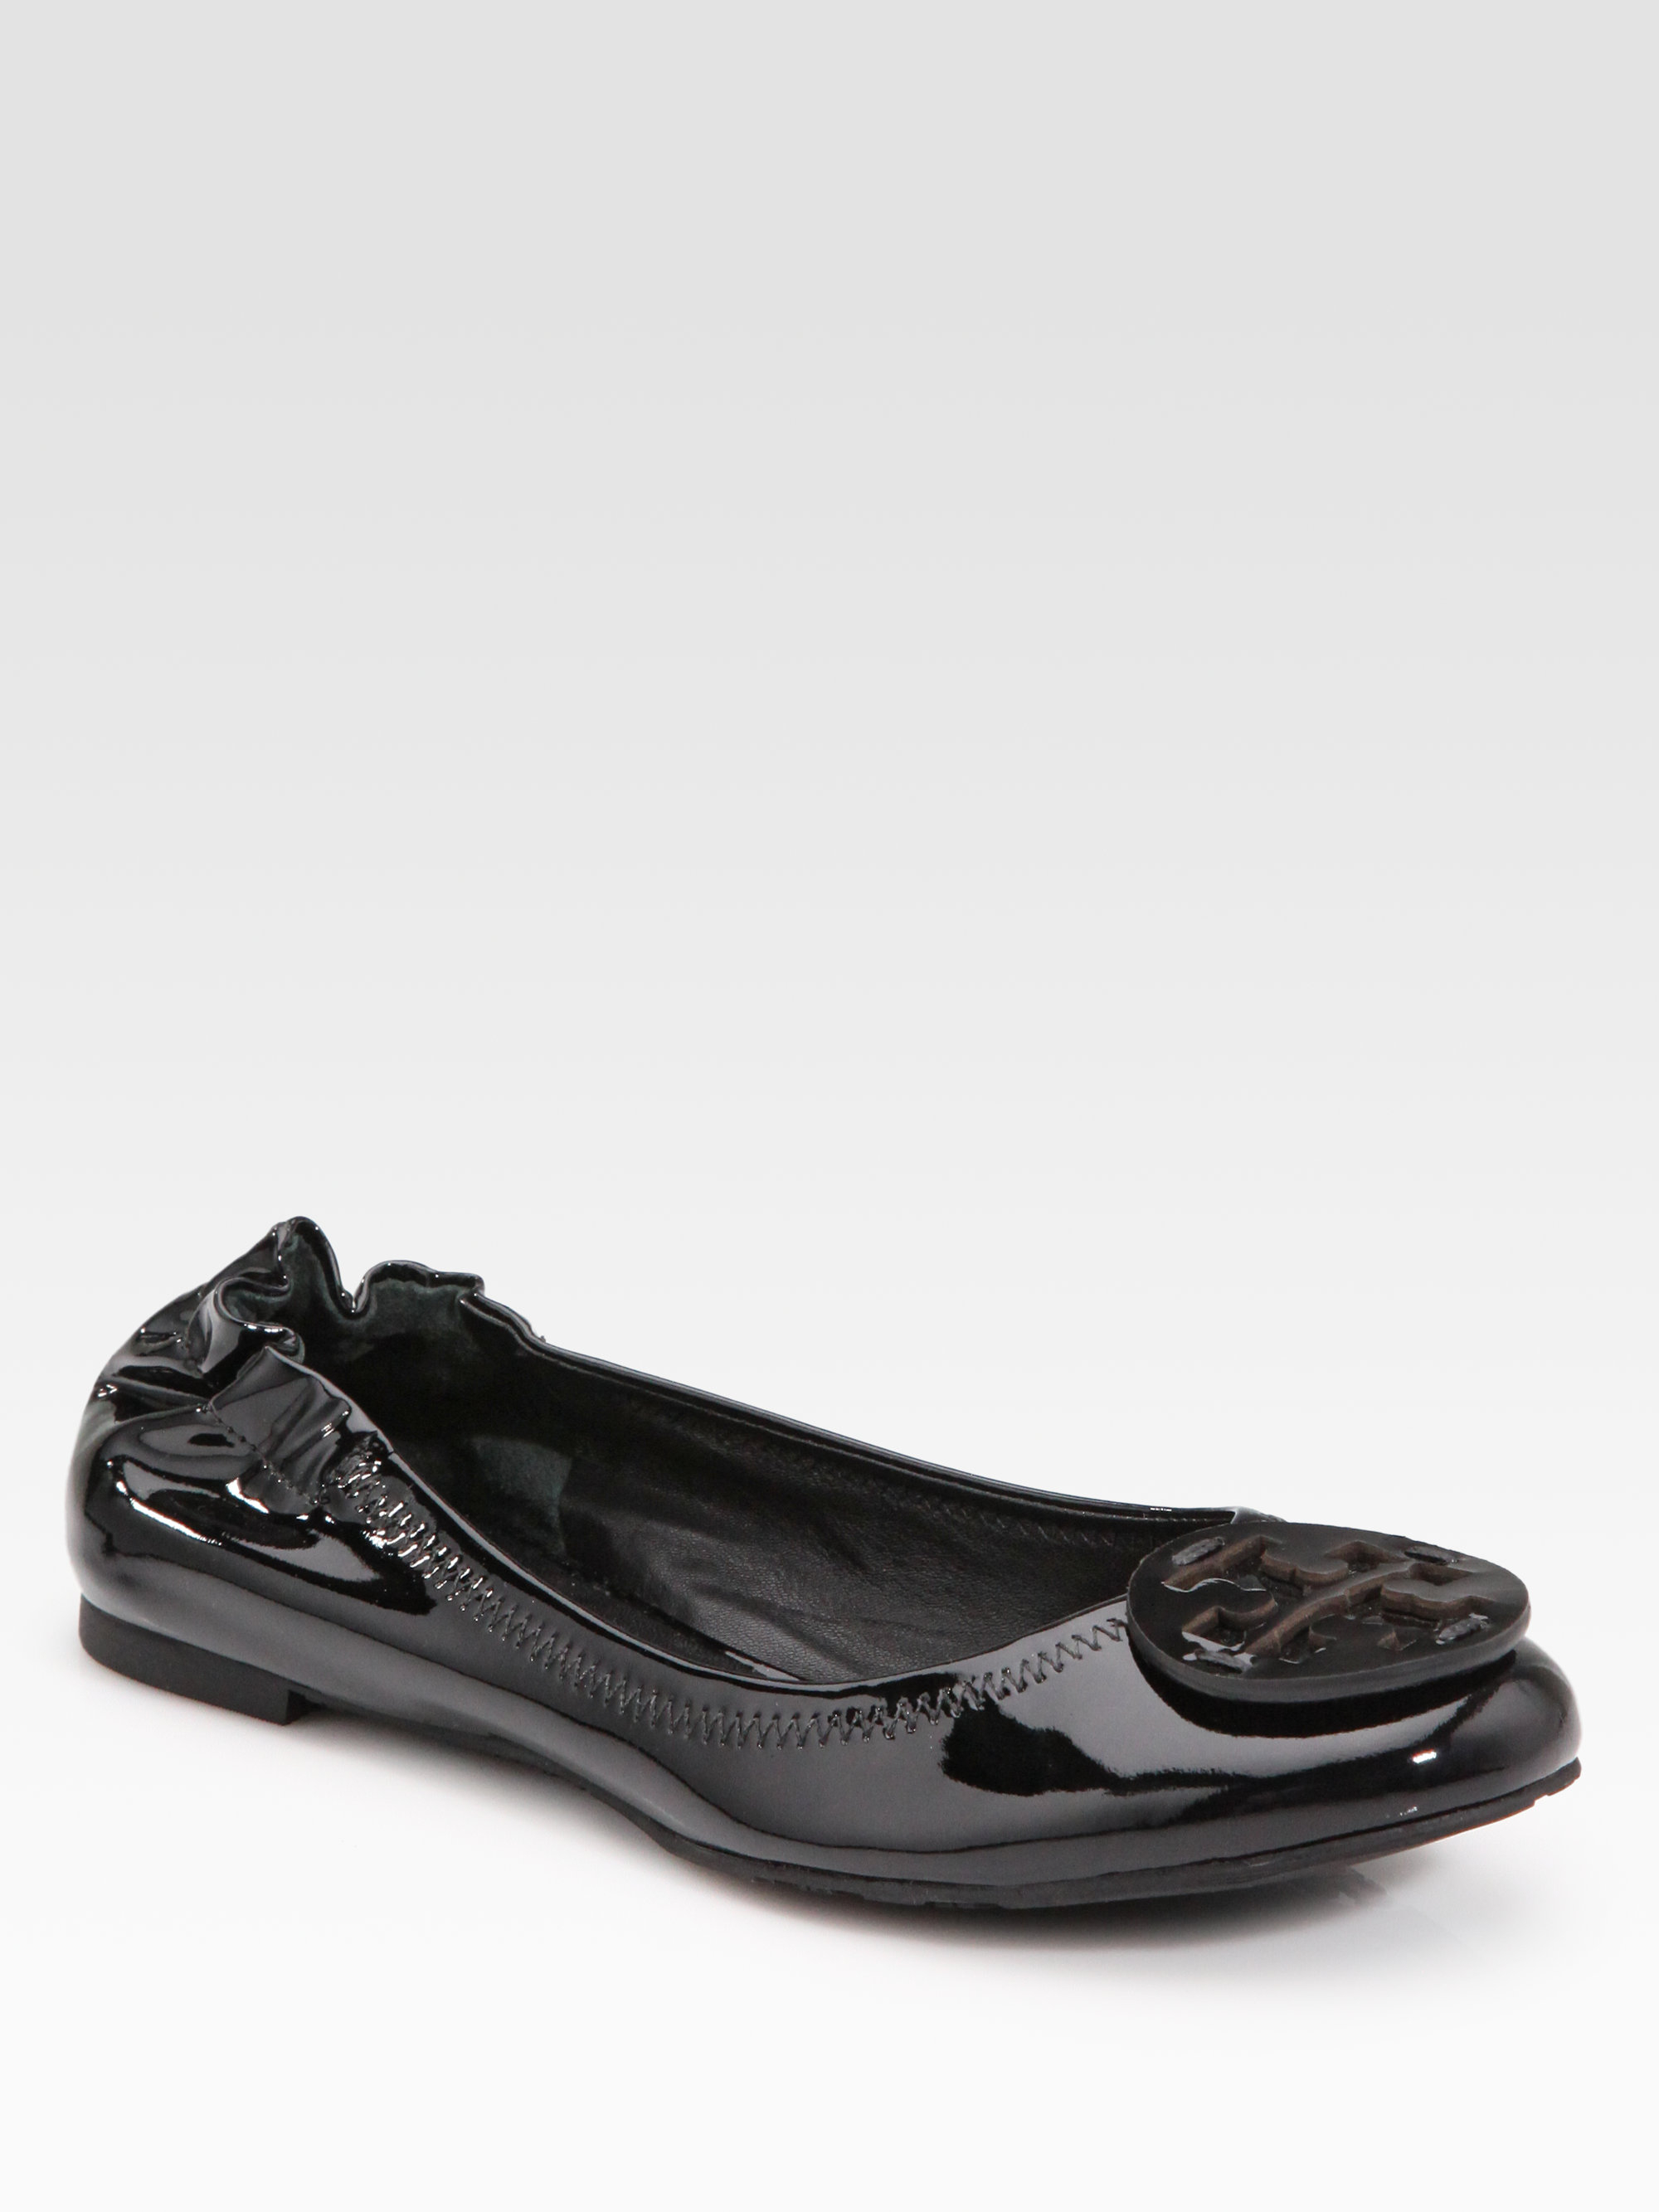 2e37374c3c4307 ... new zealand lyst tory burch reva patent leather ballet flats in black  60fd9 ec829